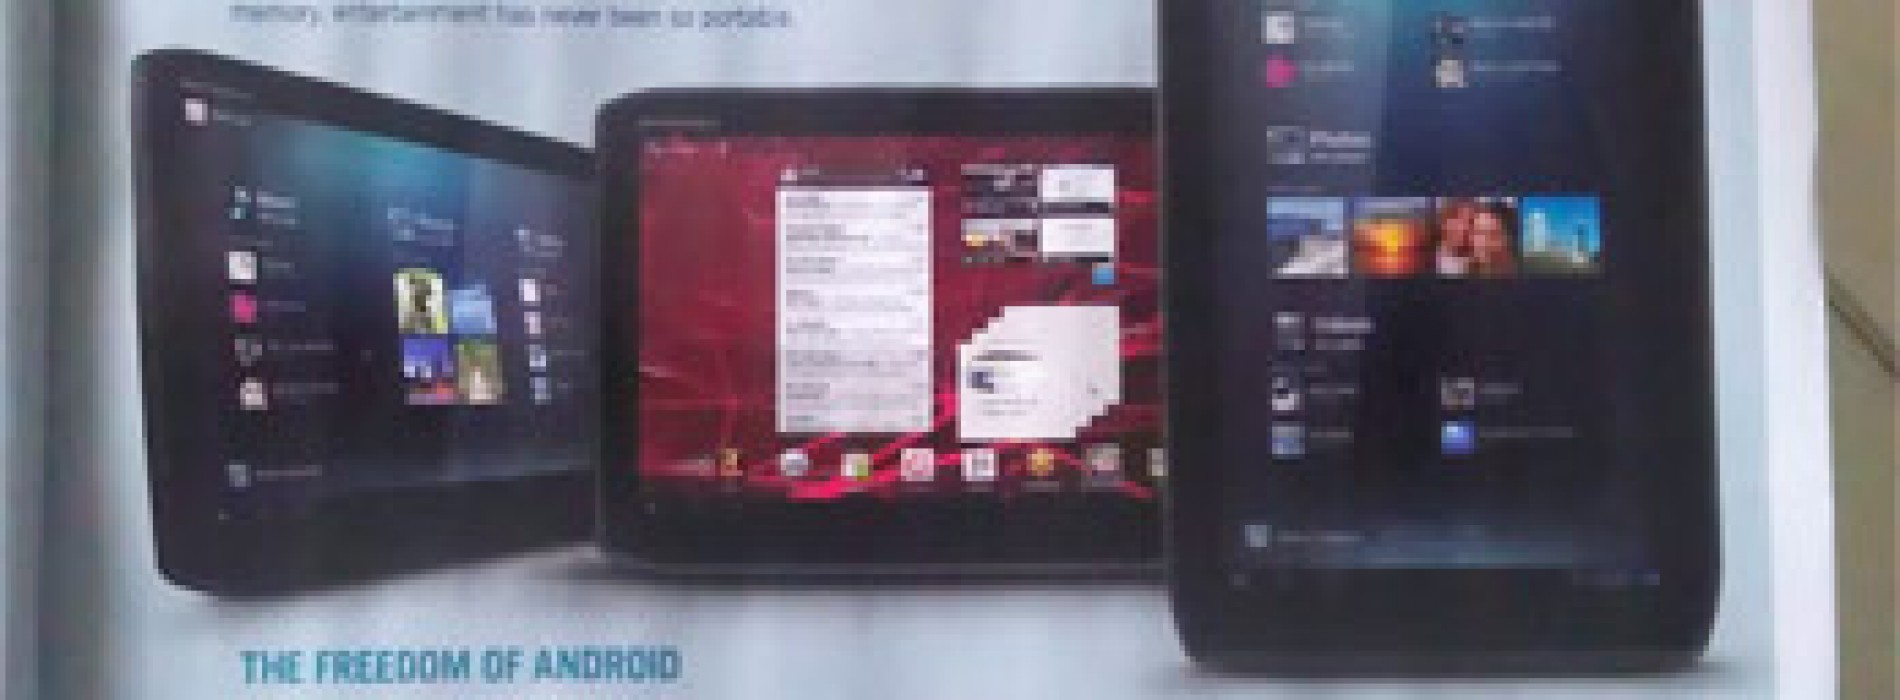 Carphone Warehouse: Wi-Fi Xoom 2 to run €399 when it debuts